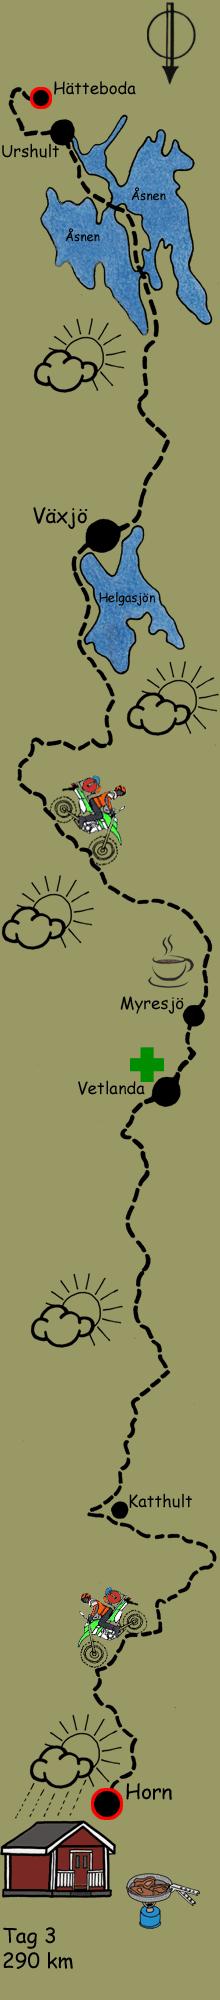 Urshult Växjö Route